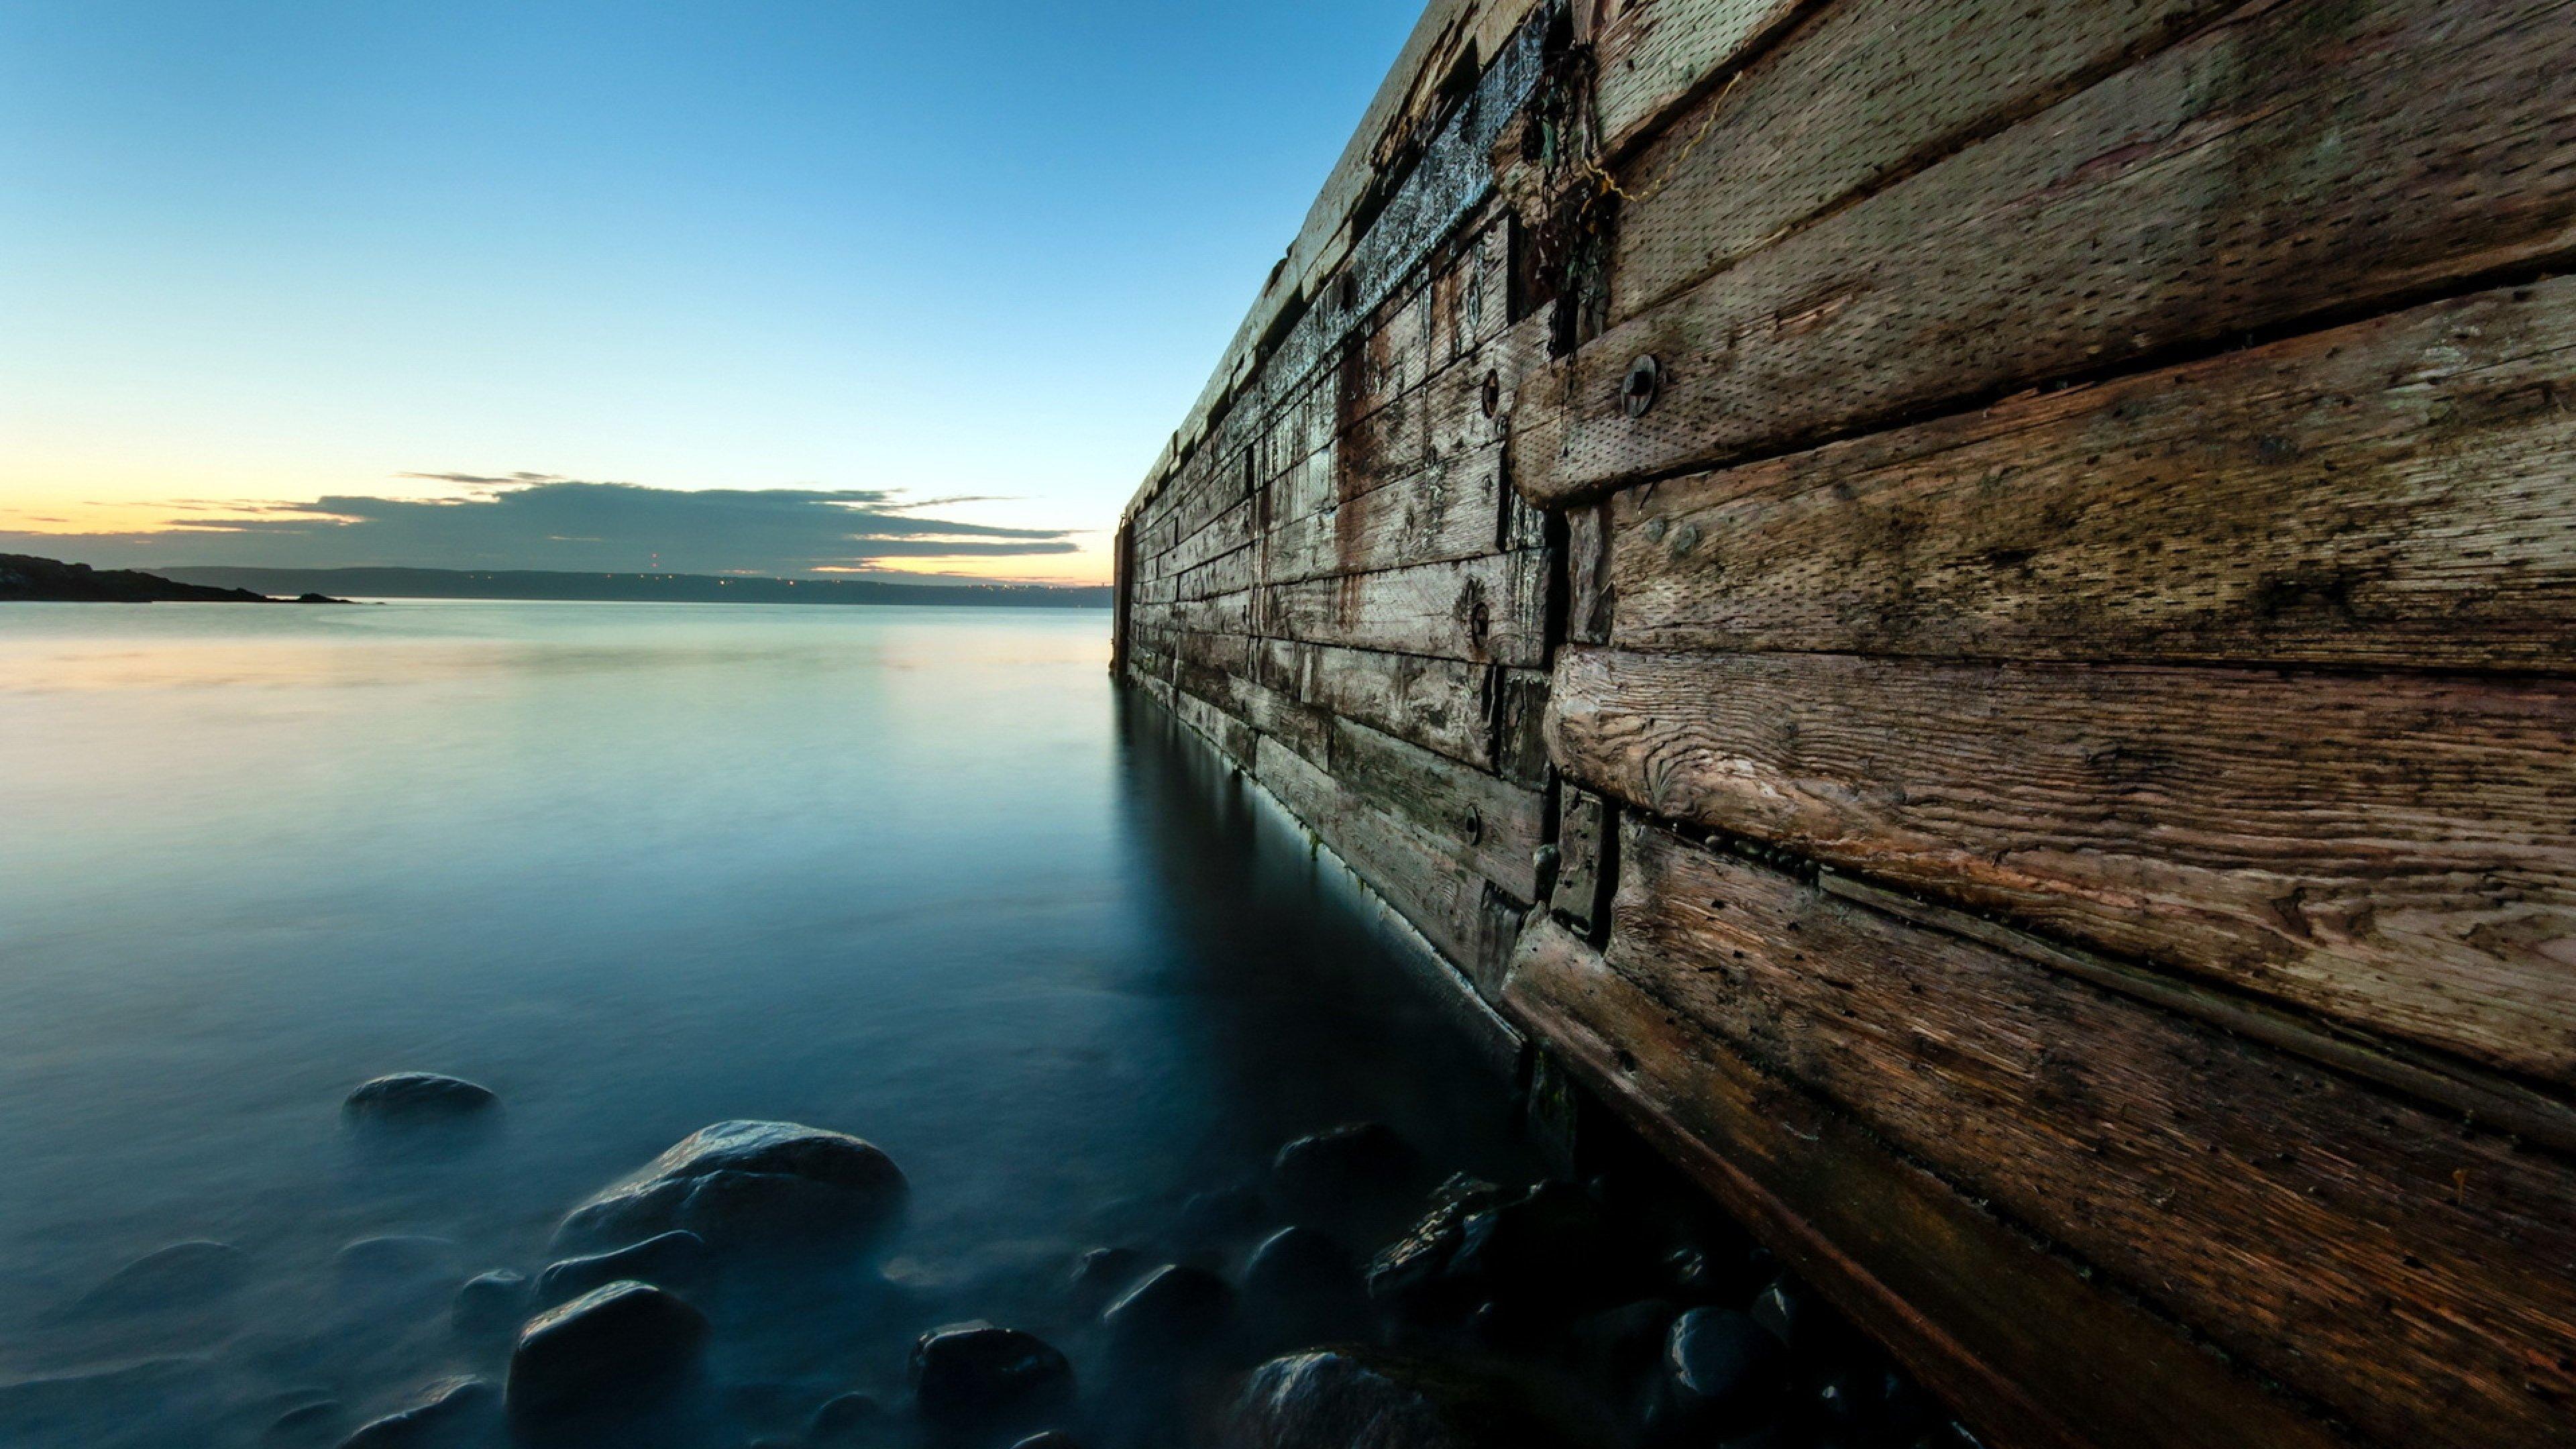 Download Wallpaper 3840x2160 Night Lake Bridge Landscape 4K Ultra 3840x2160